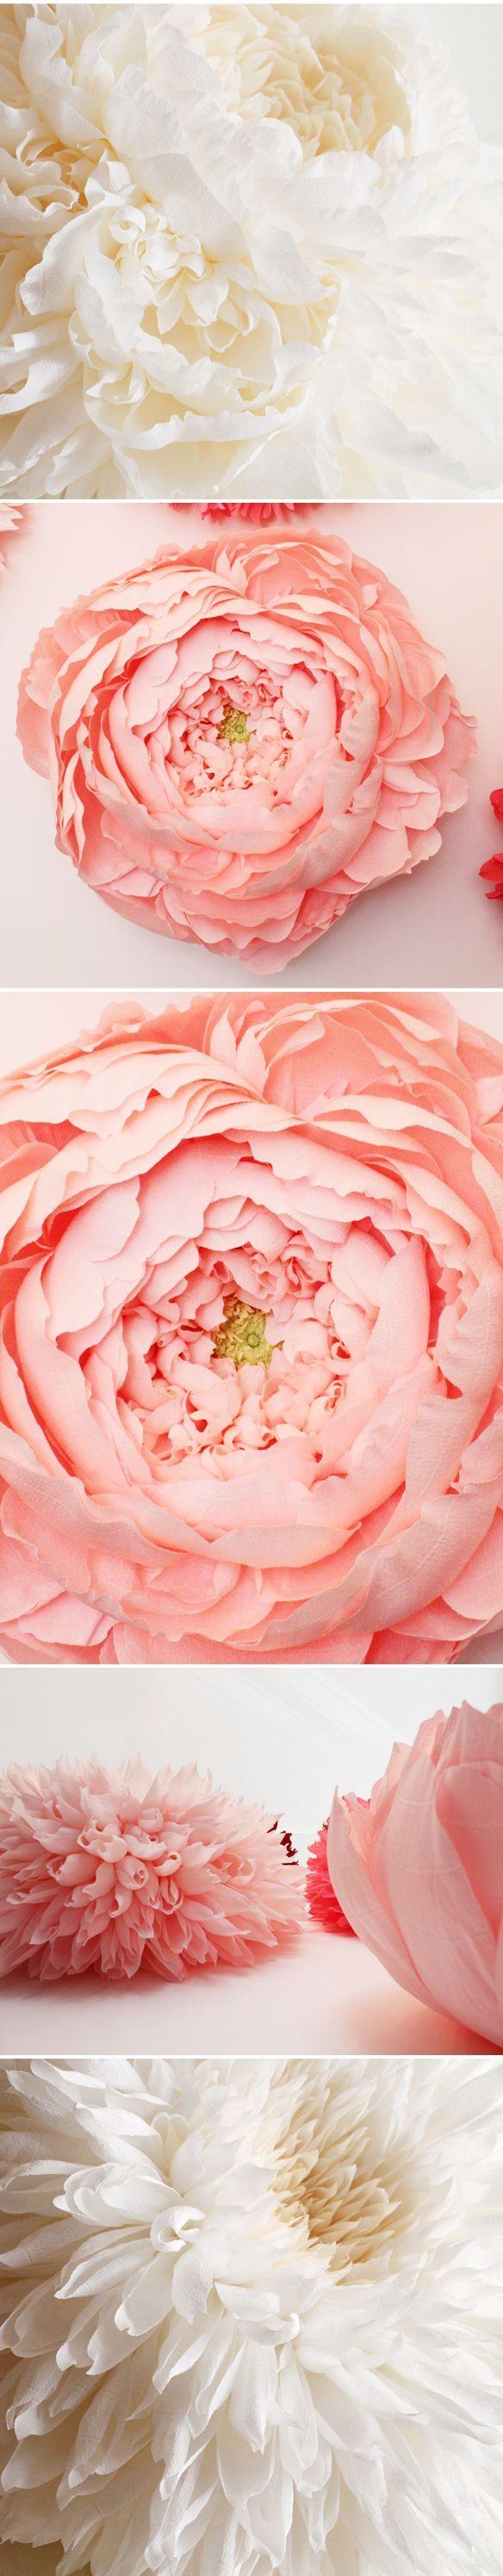 Handmade paper flowers #kissesandcake #weddingstyling #florals  http://www.kissesandcake.com.au/blog-diy/2014/11/19/handmade-paper-flowers